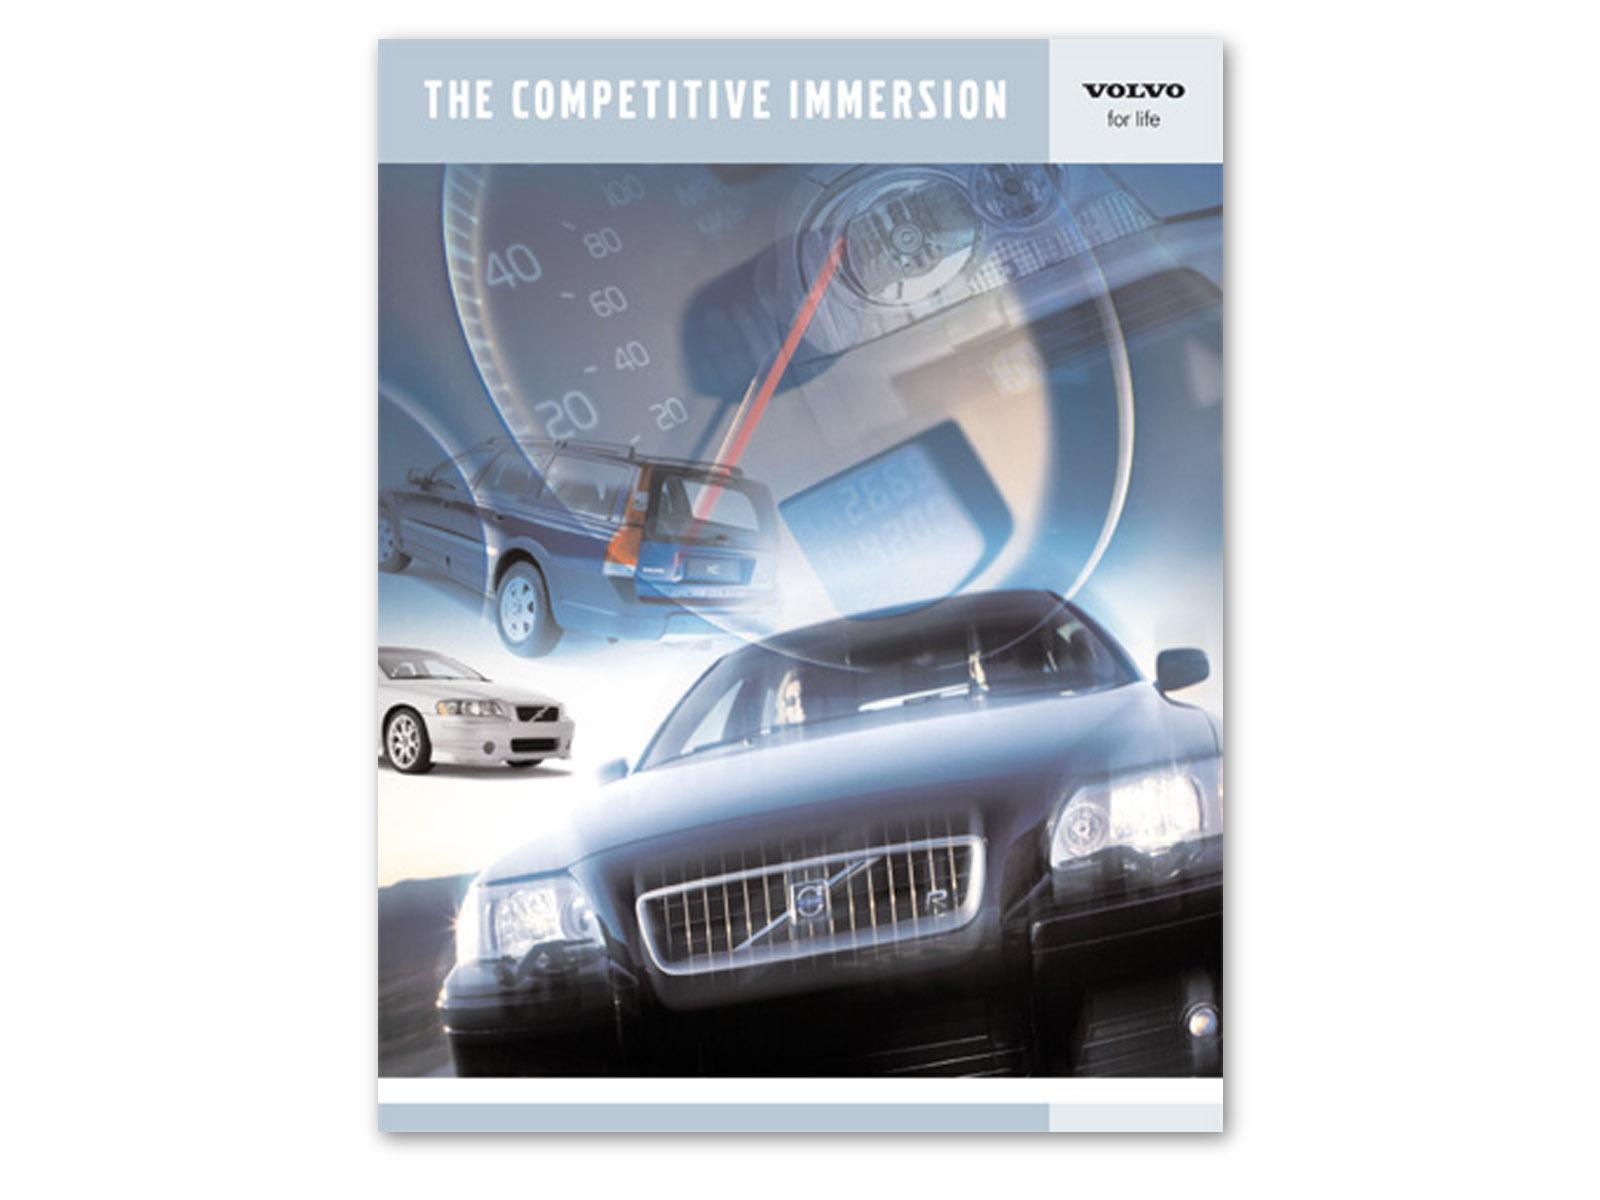 Volvo Emersion